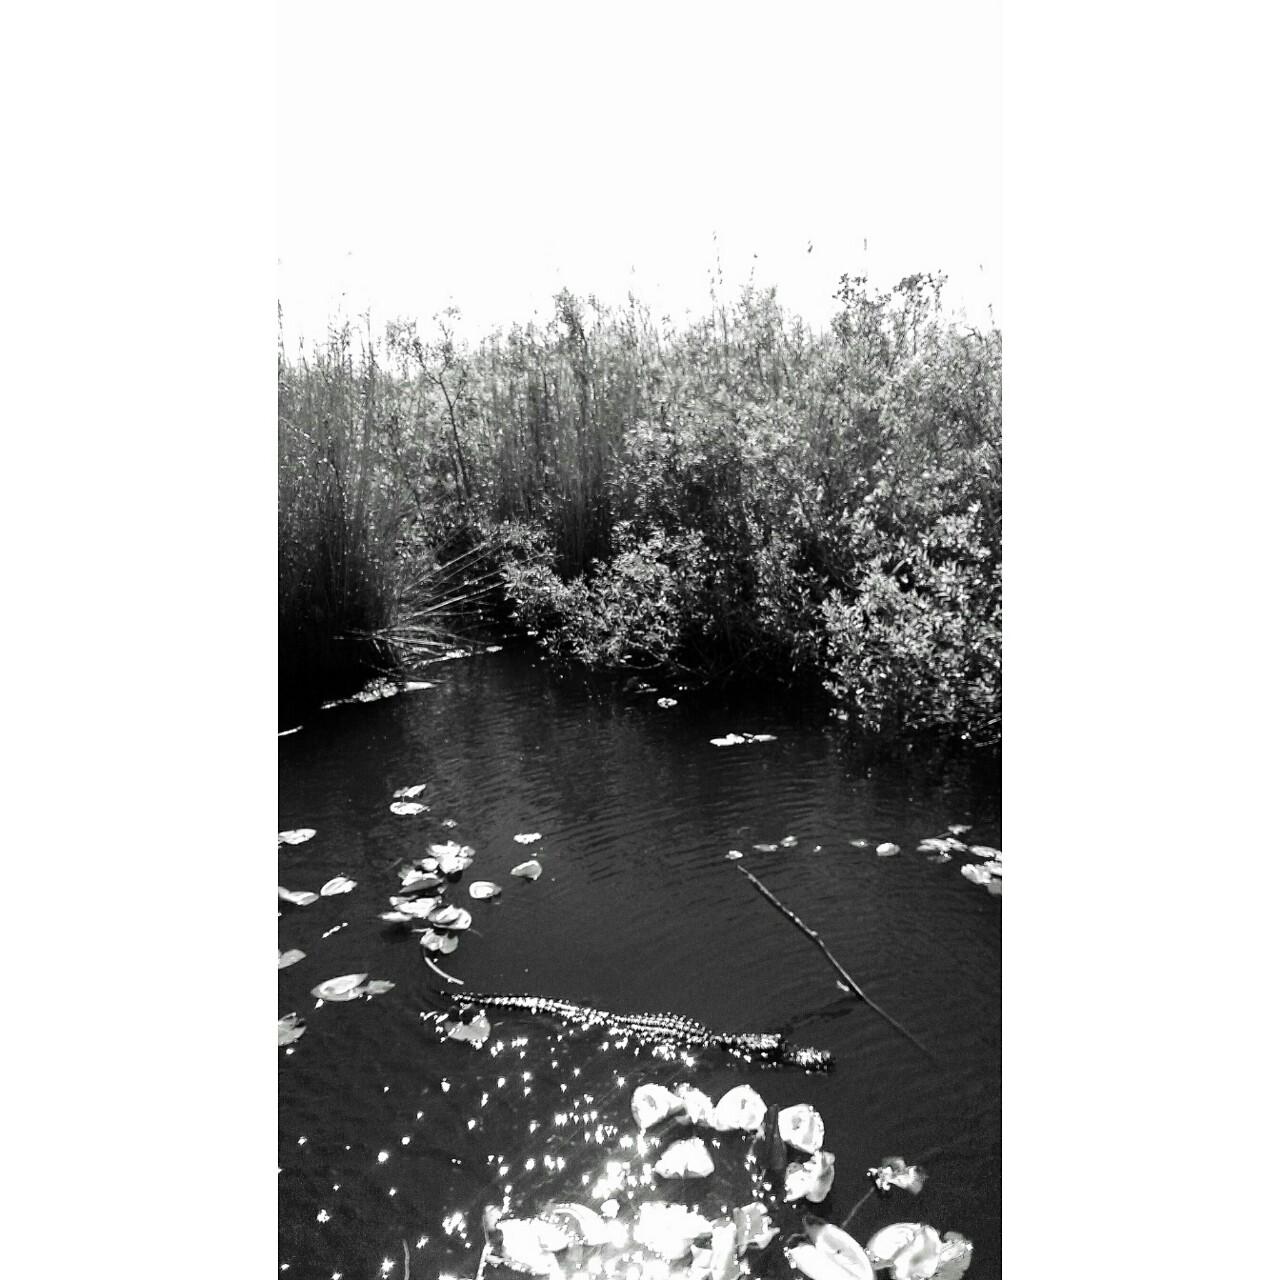 Everglades National Reserve Homestead, FL